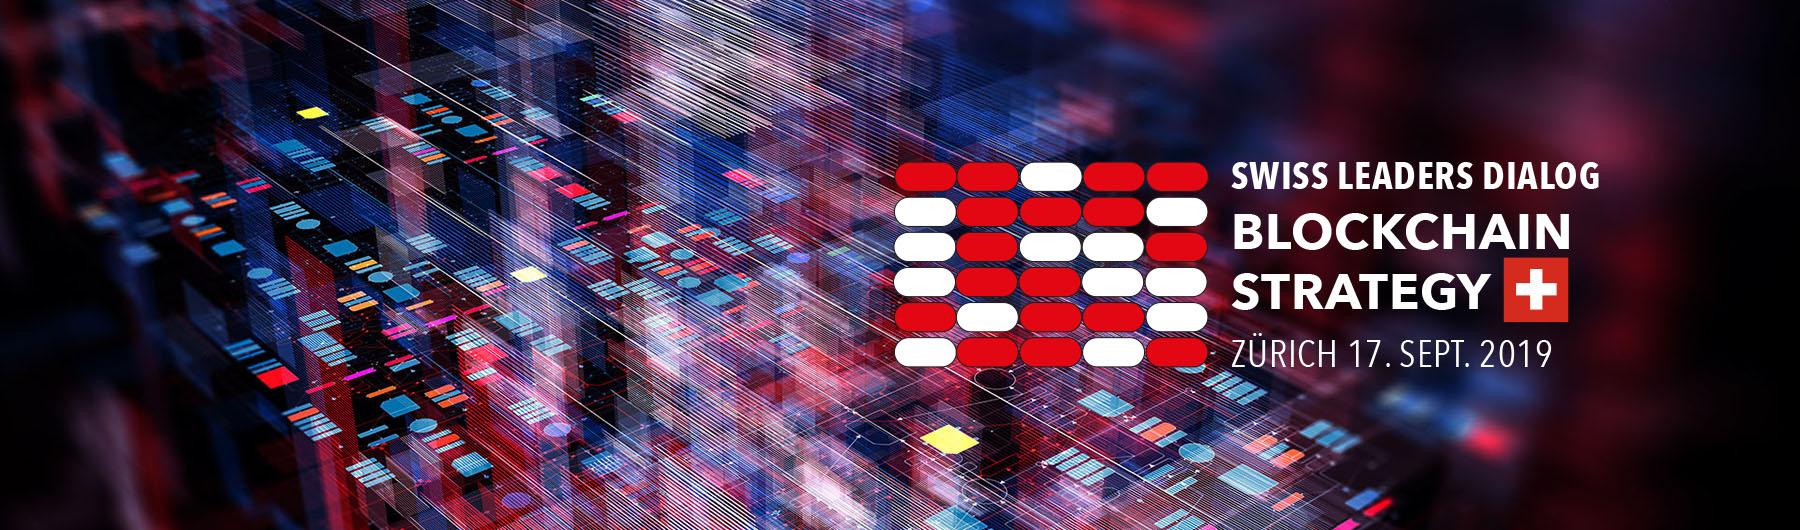 Swiss Leaders Dialog Blockchain Strategy 2019